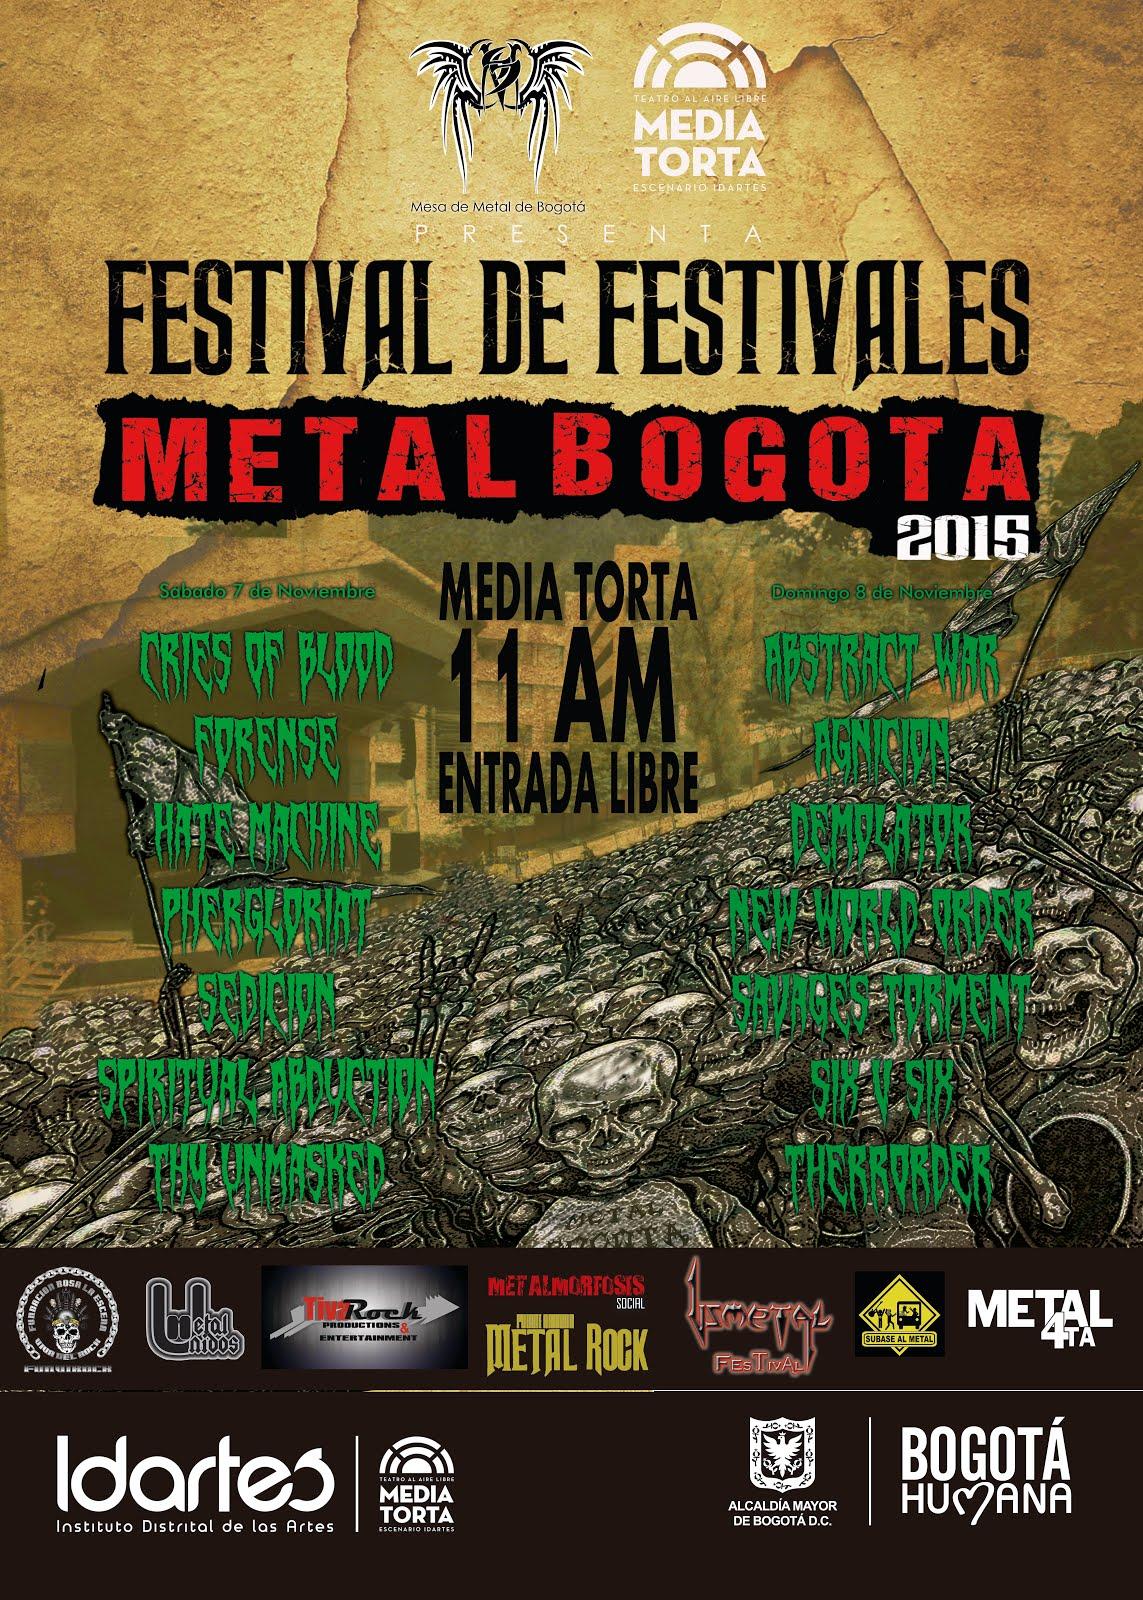 Festival de Festivales Metal Bogotá 2015